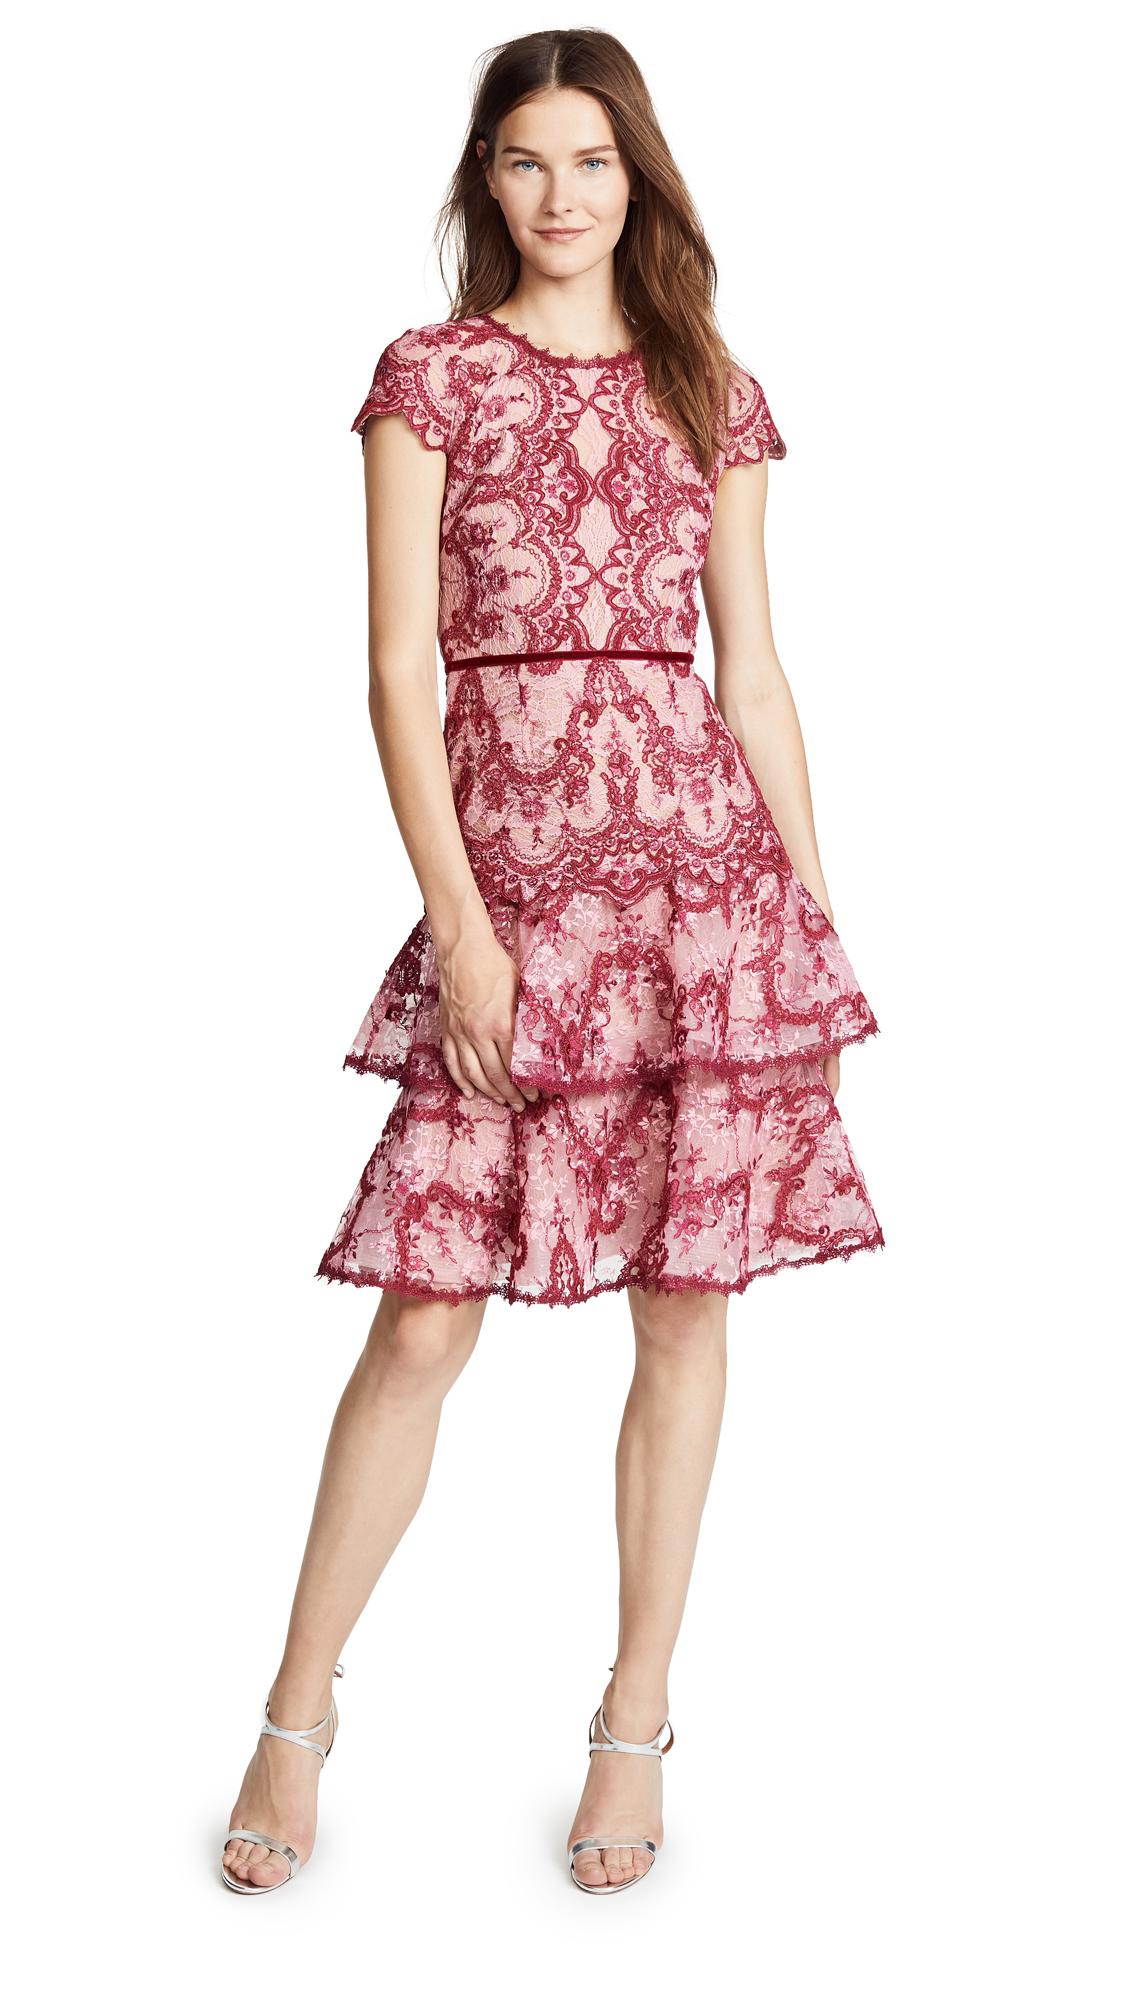 Marchesa Notte Cap Sleeve Cocktail Dress